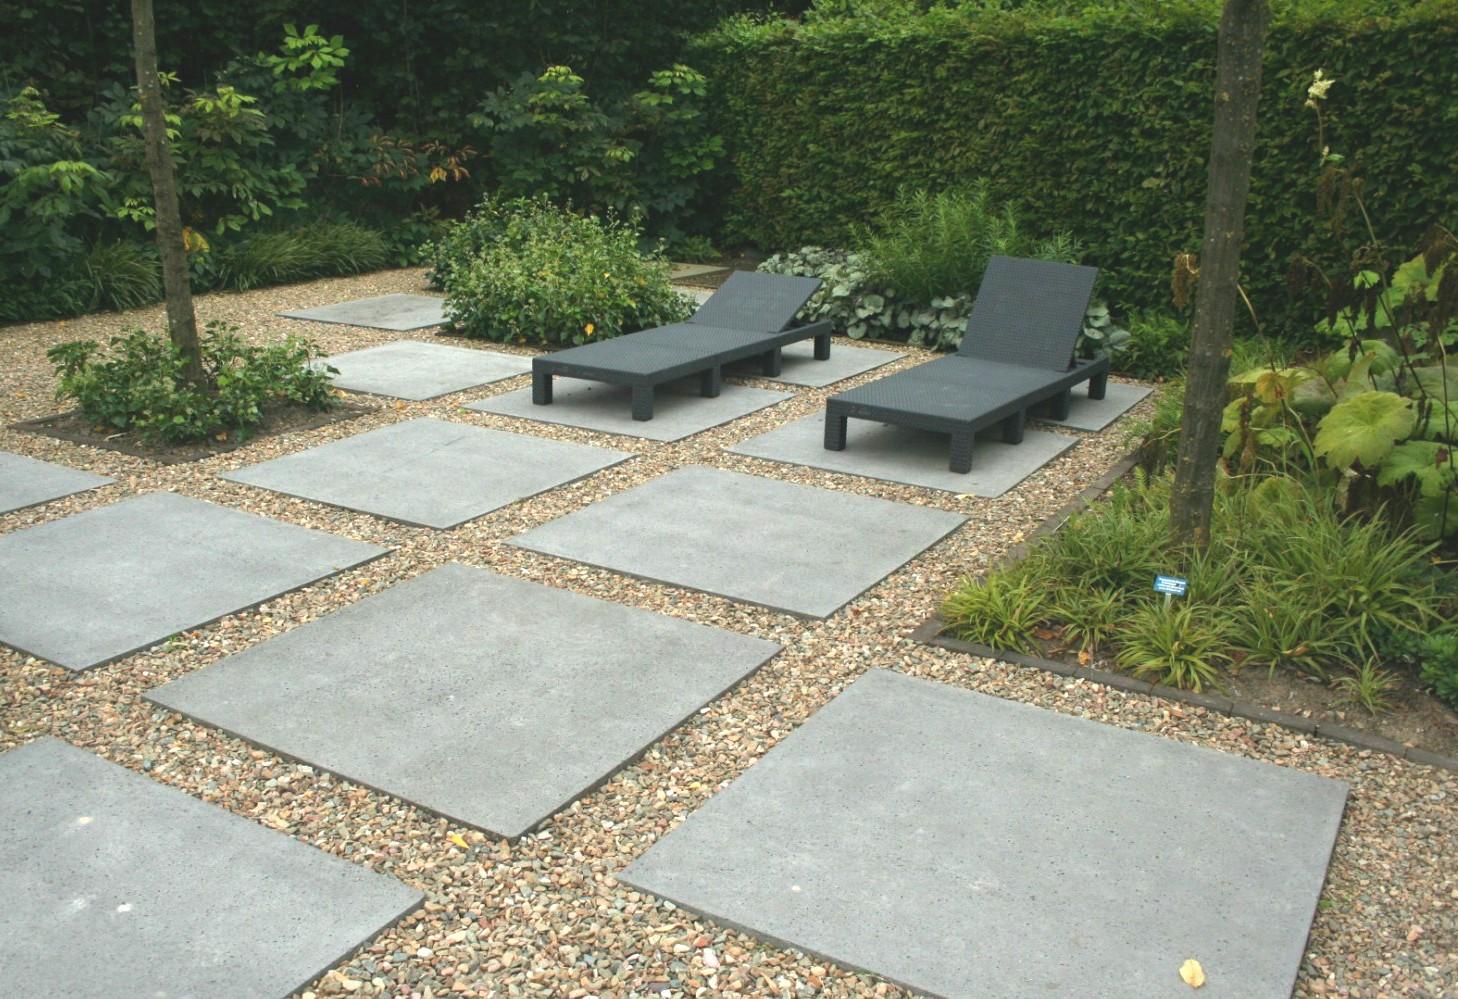 Patroon met grote tegels geeft rust en vorm by geral overbeek